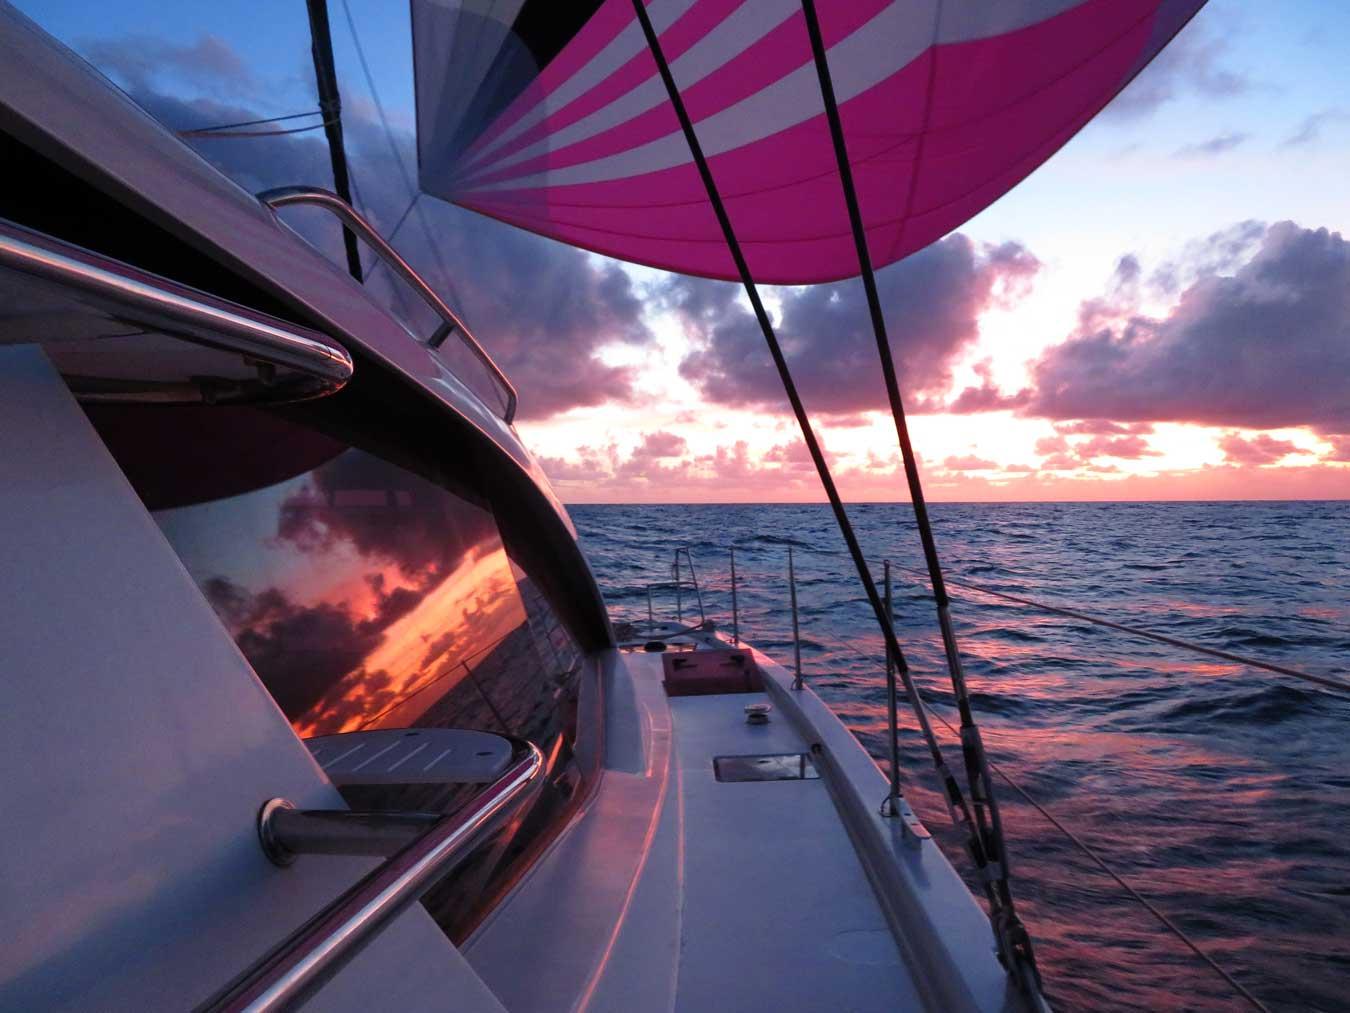 LANDSTAND! Atlantic Crossing II Summary